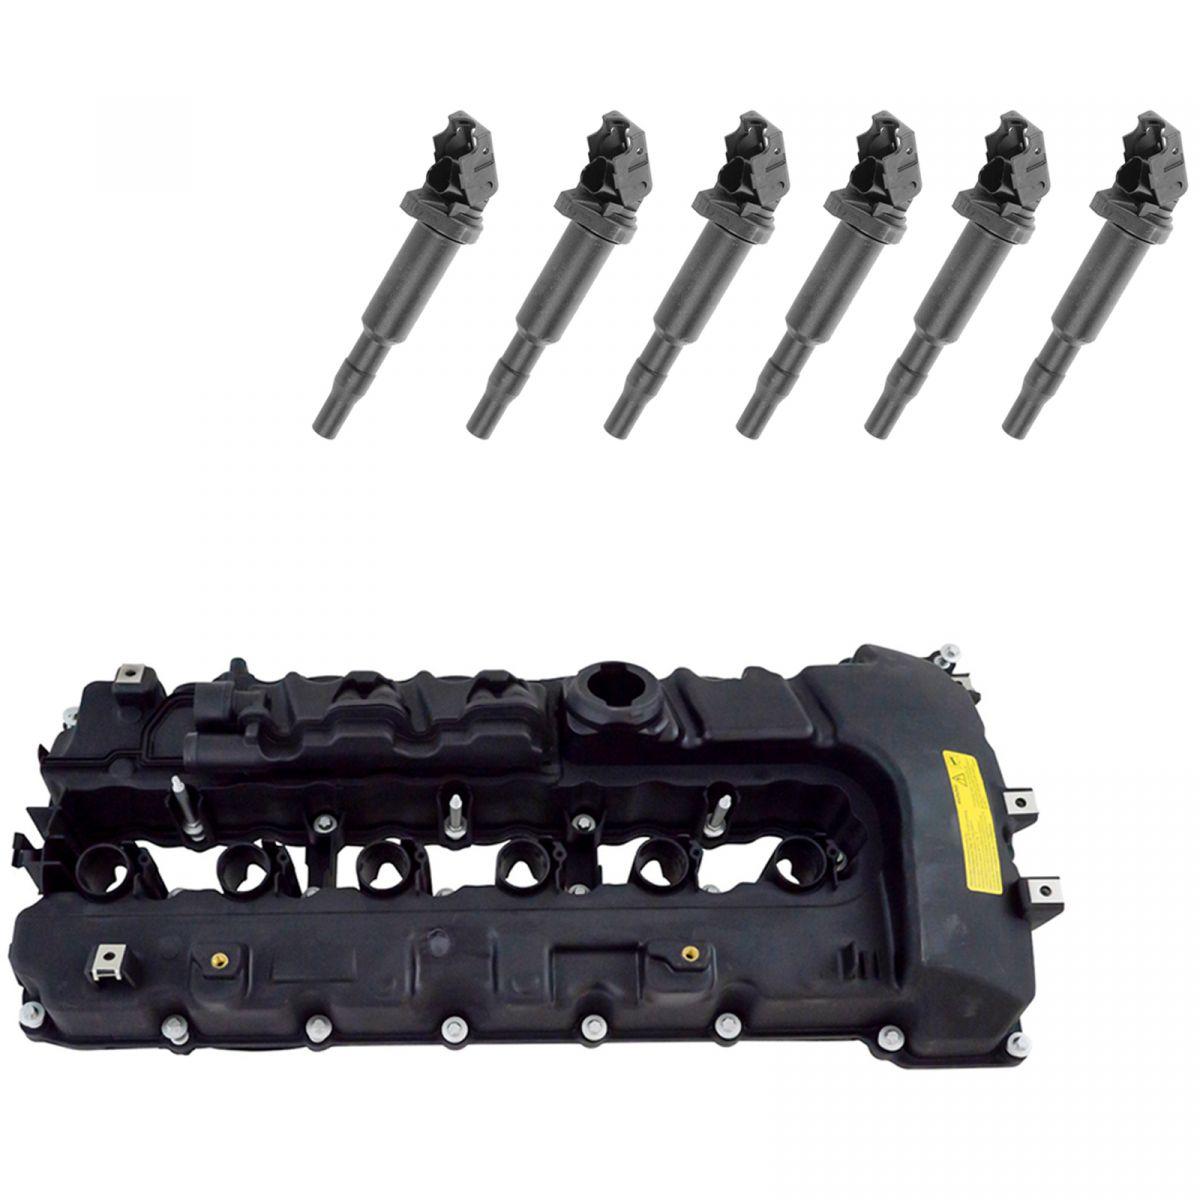 Engine Valve Cover Gaskets & Ignition Coil Kit Set For BMW